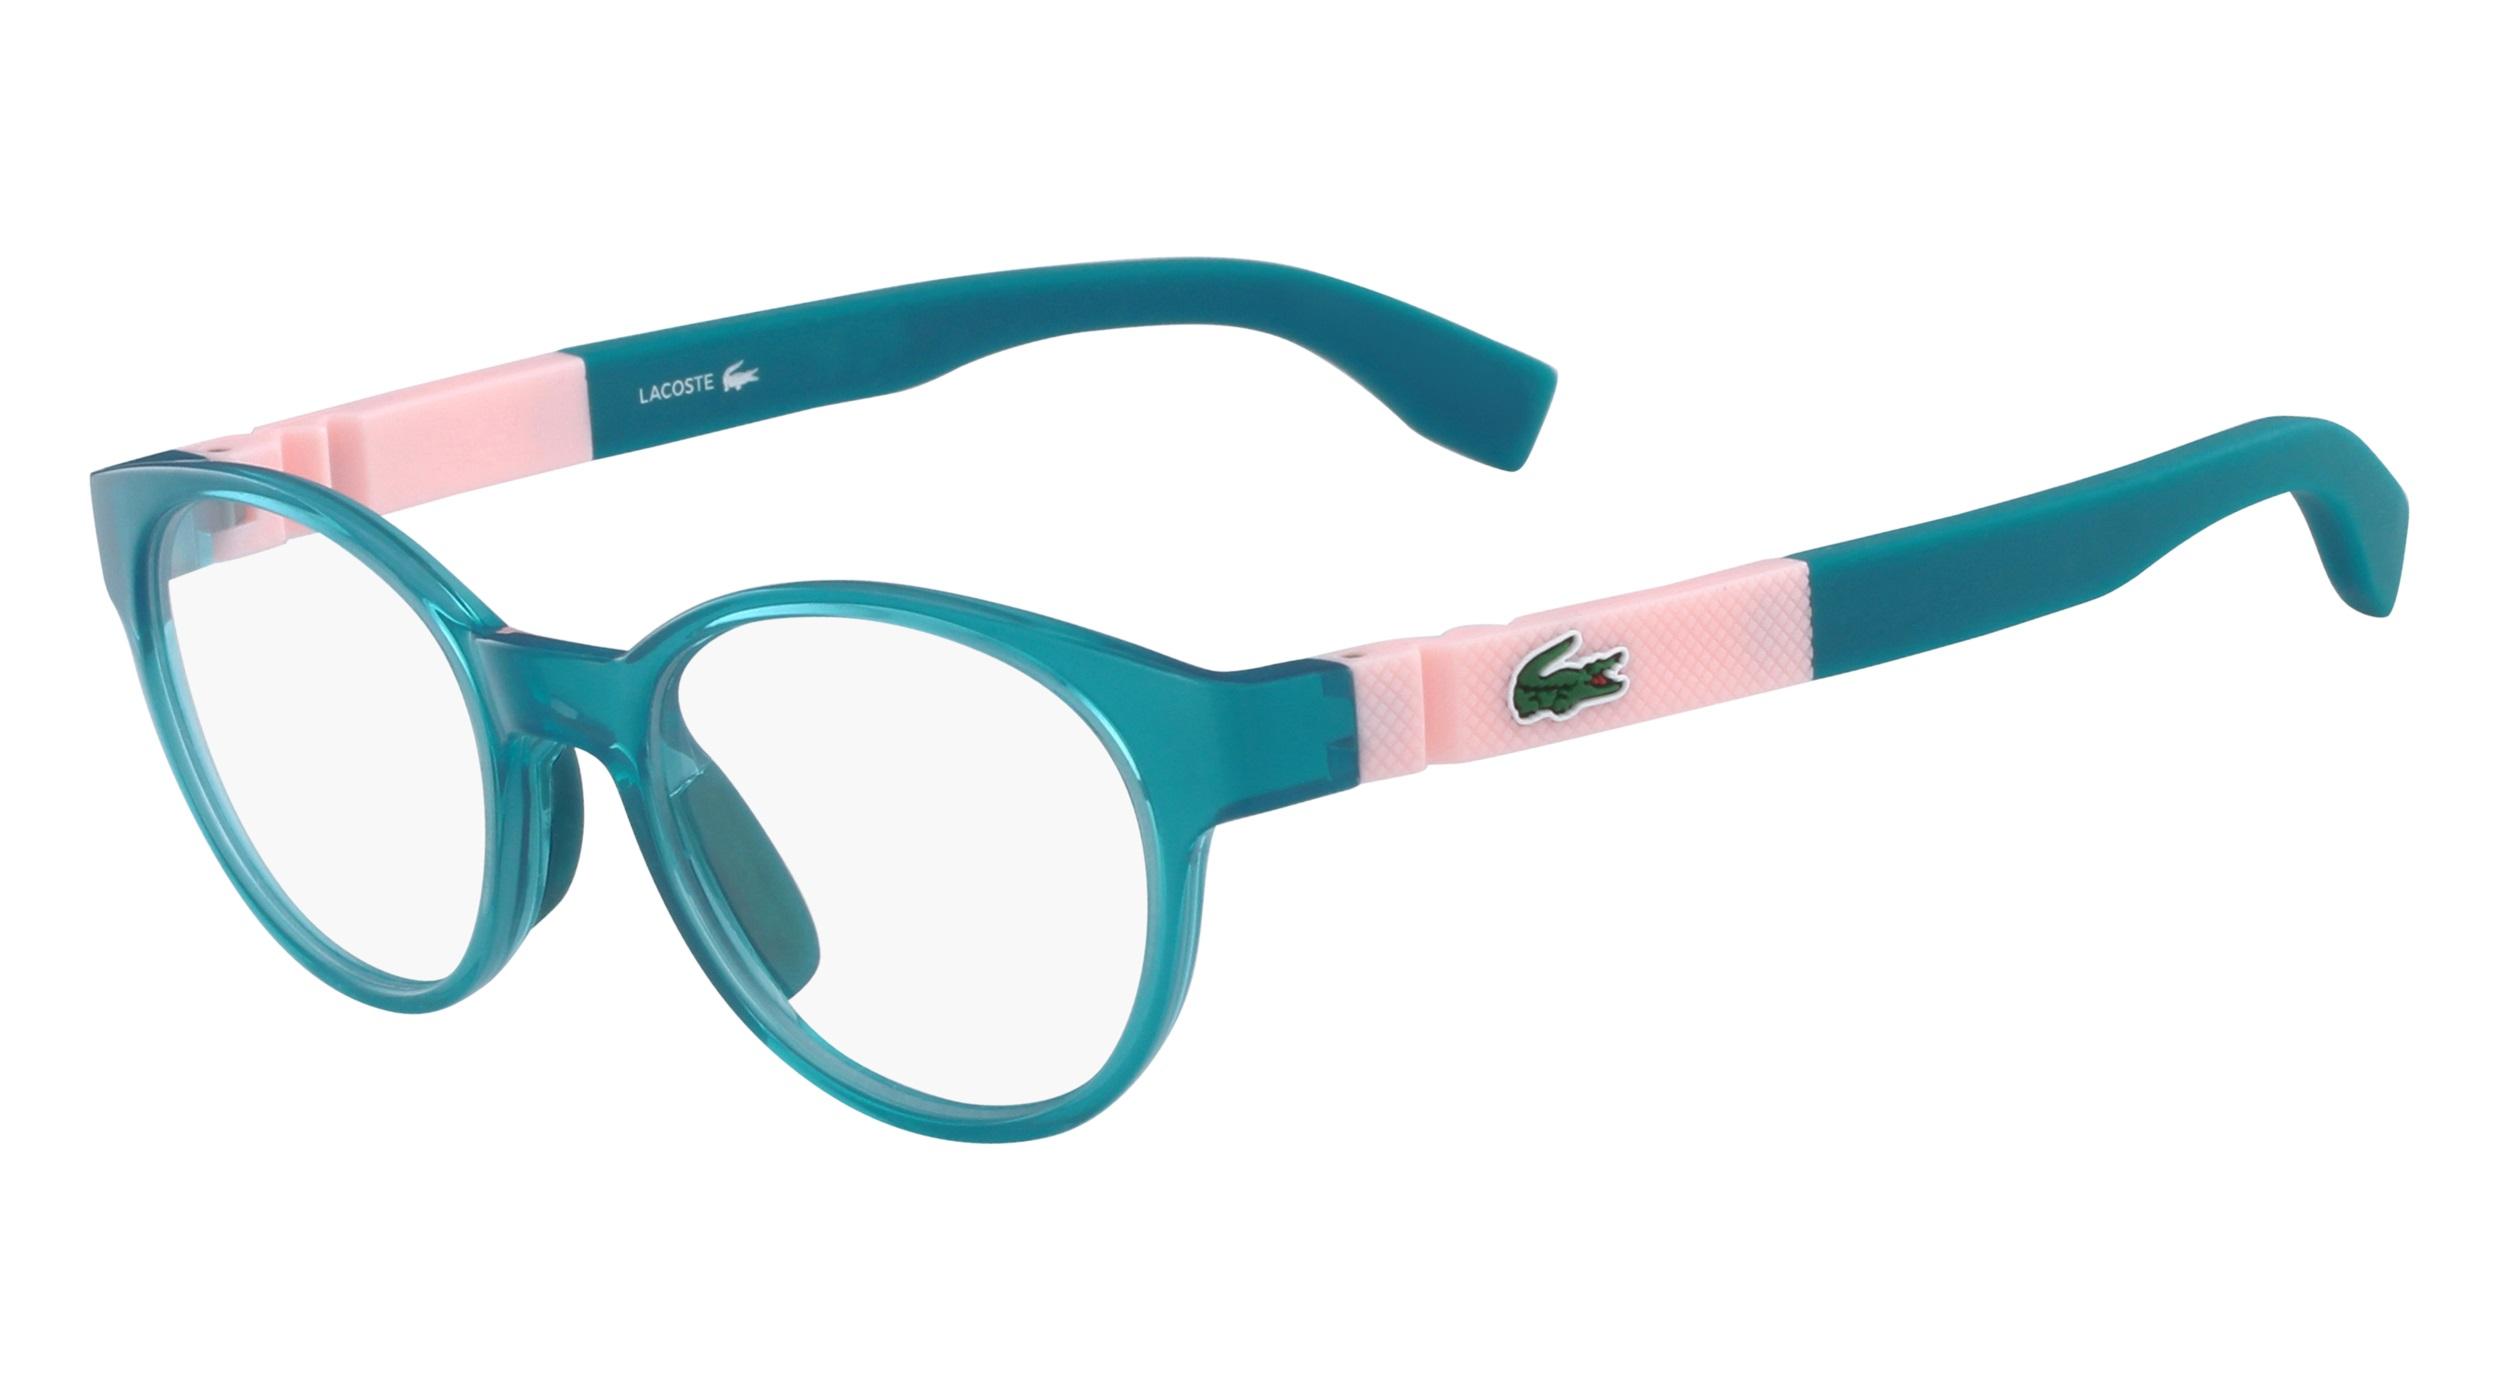 5c1ac88456788 Prescription Eye Glasses